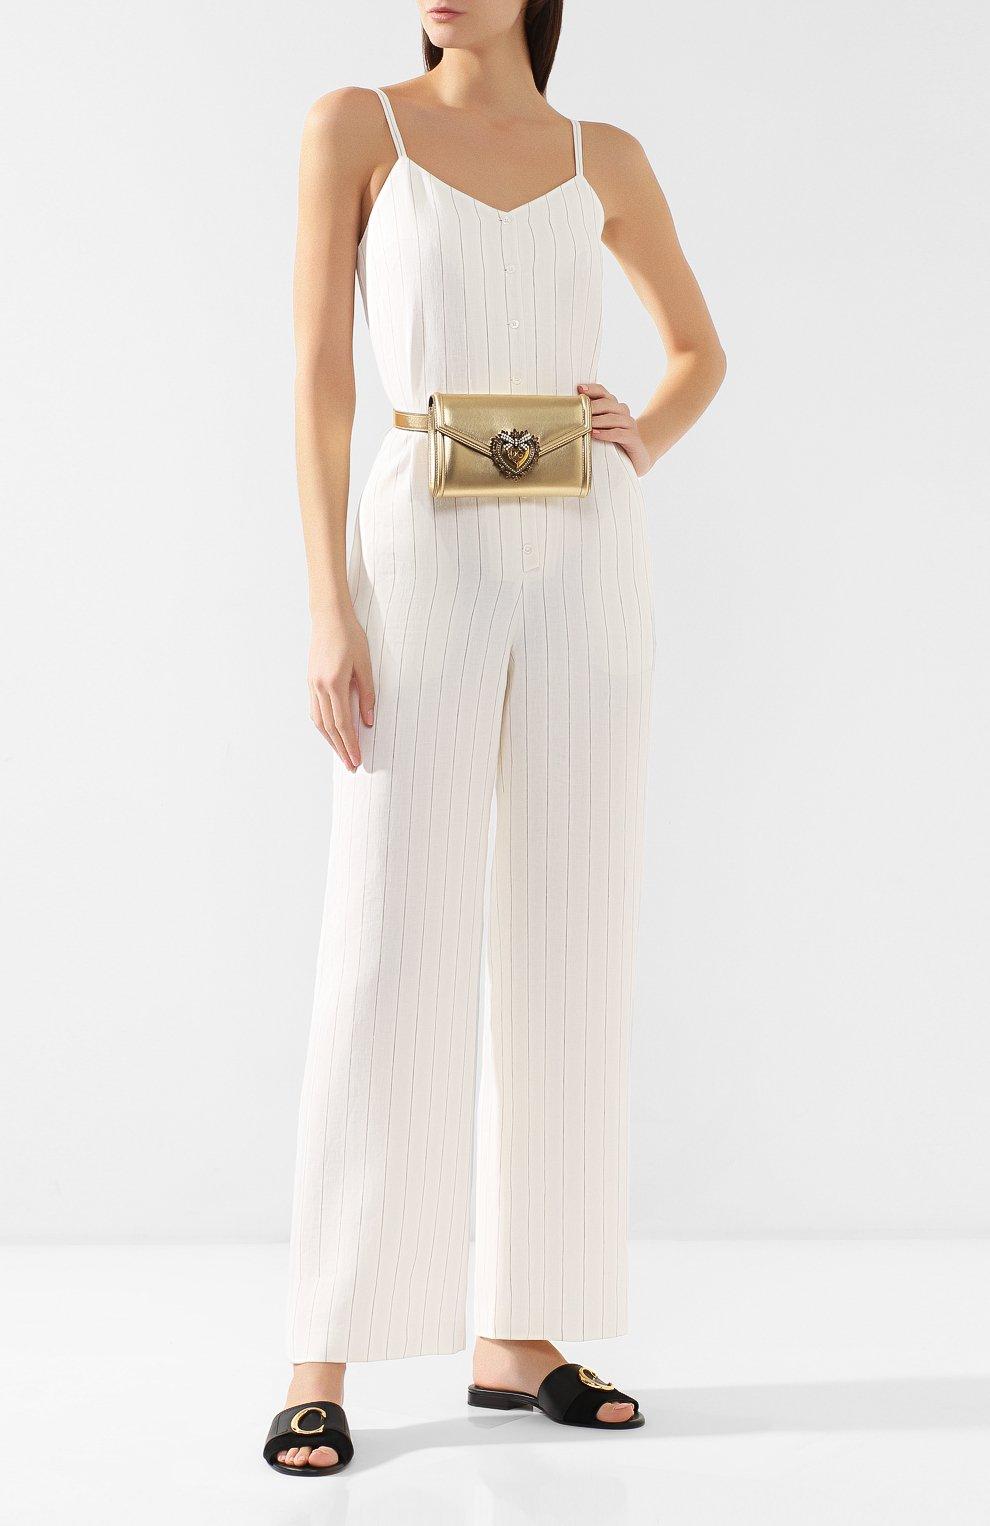 Поясная сумка Devotion Dolce & Gabbana золотая | Фото №2